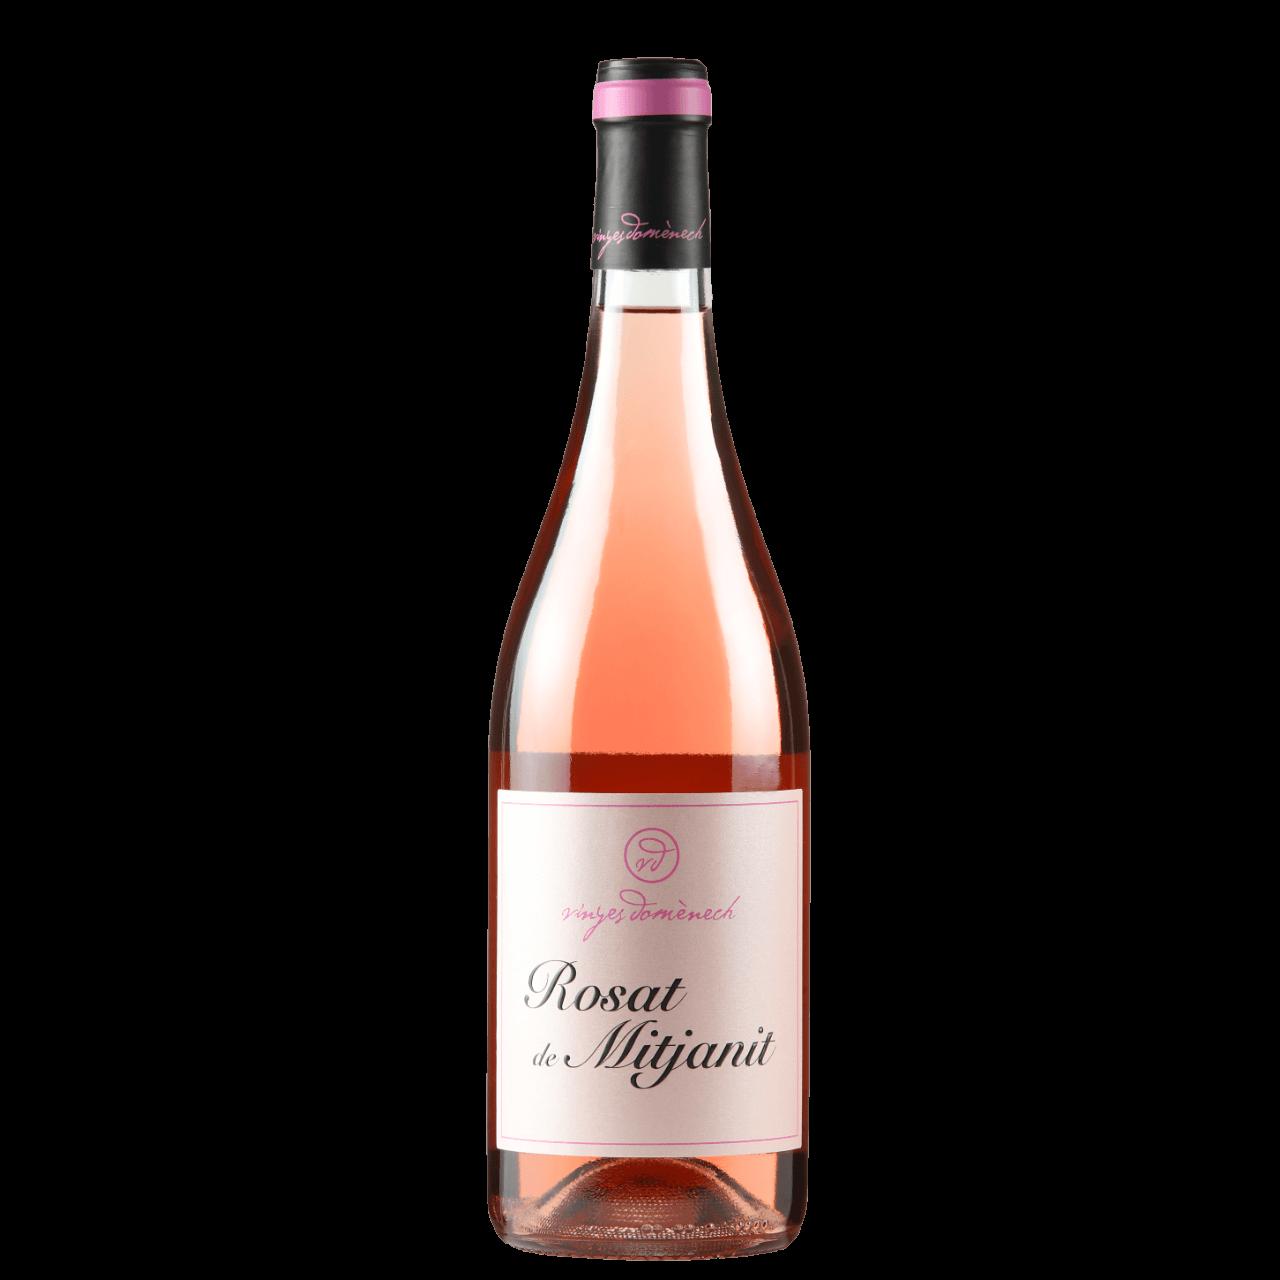 vins-rosatMitjanit